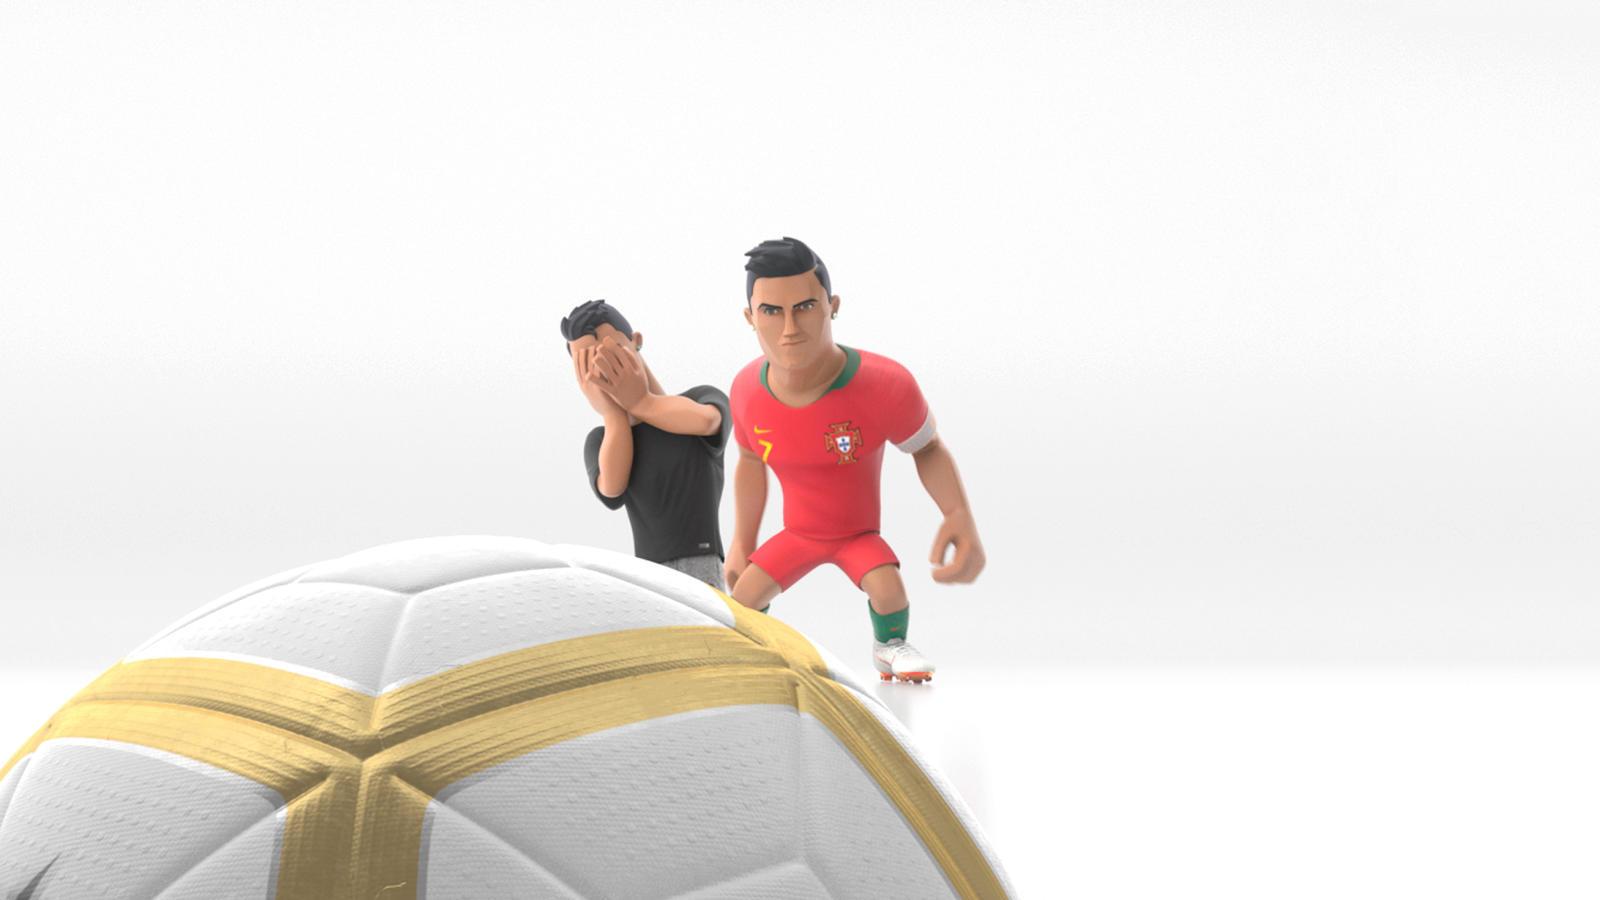 Ronaldo believe the ball 05 hd 1600